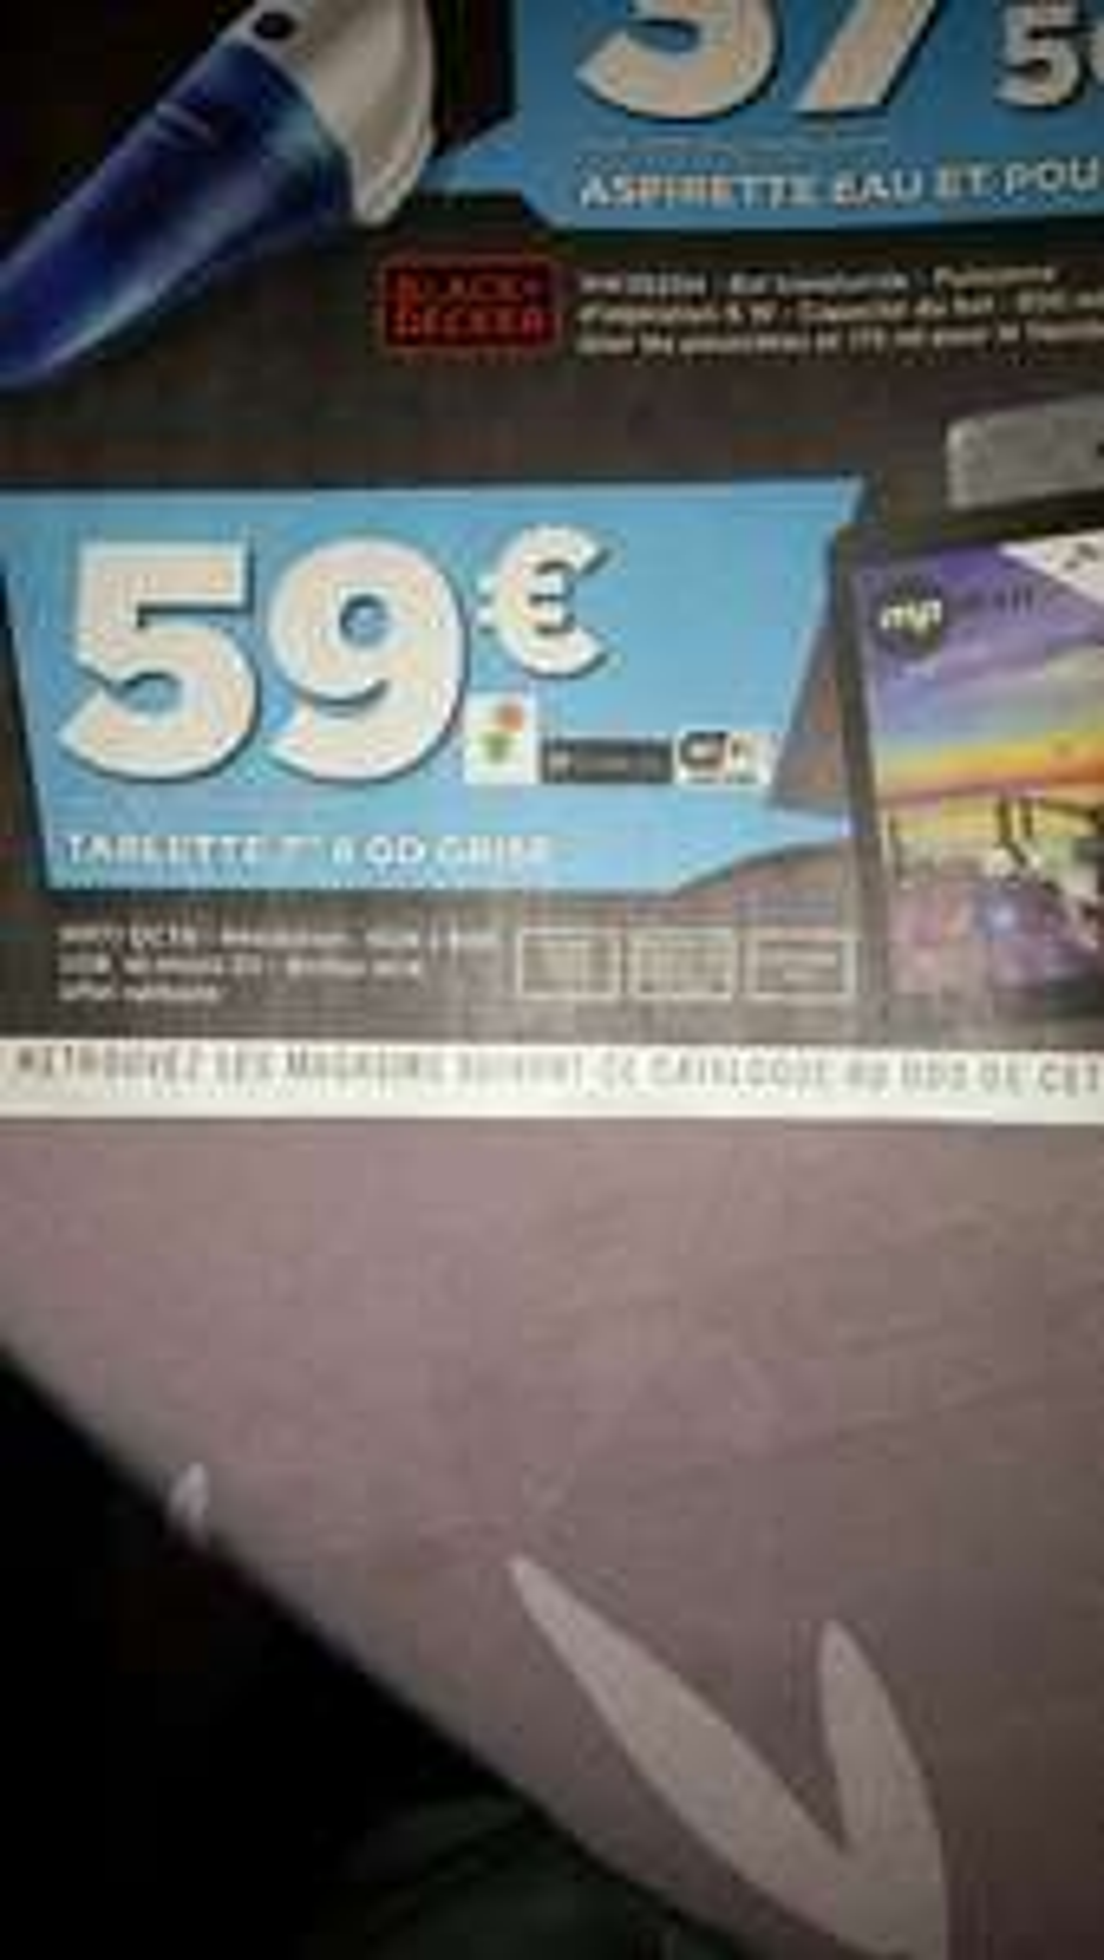 "Tablette 7"" MPMan MP71 Octa 8 Go"